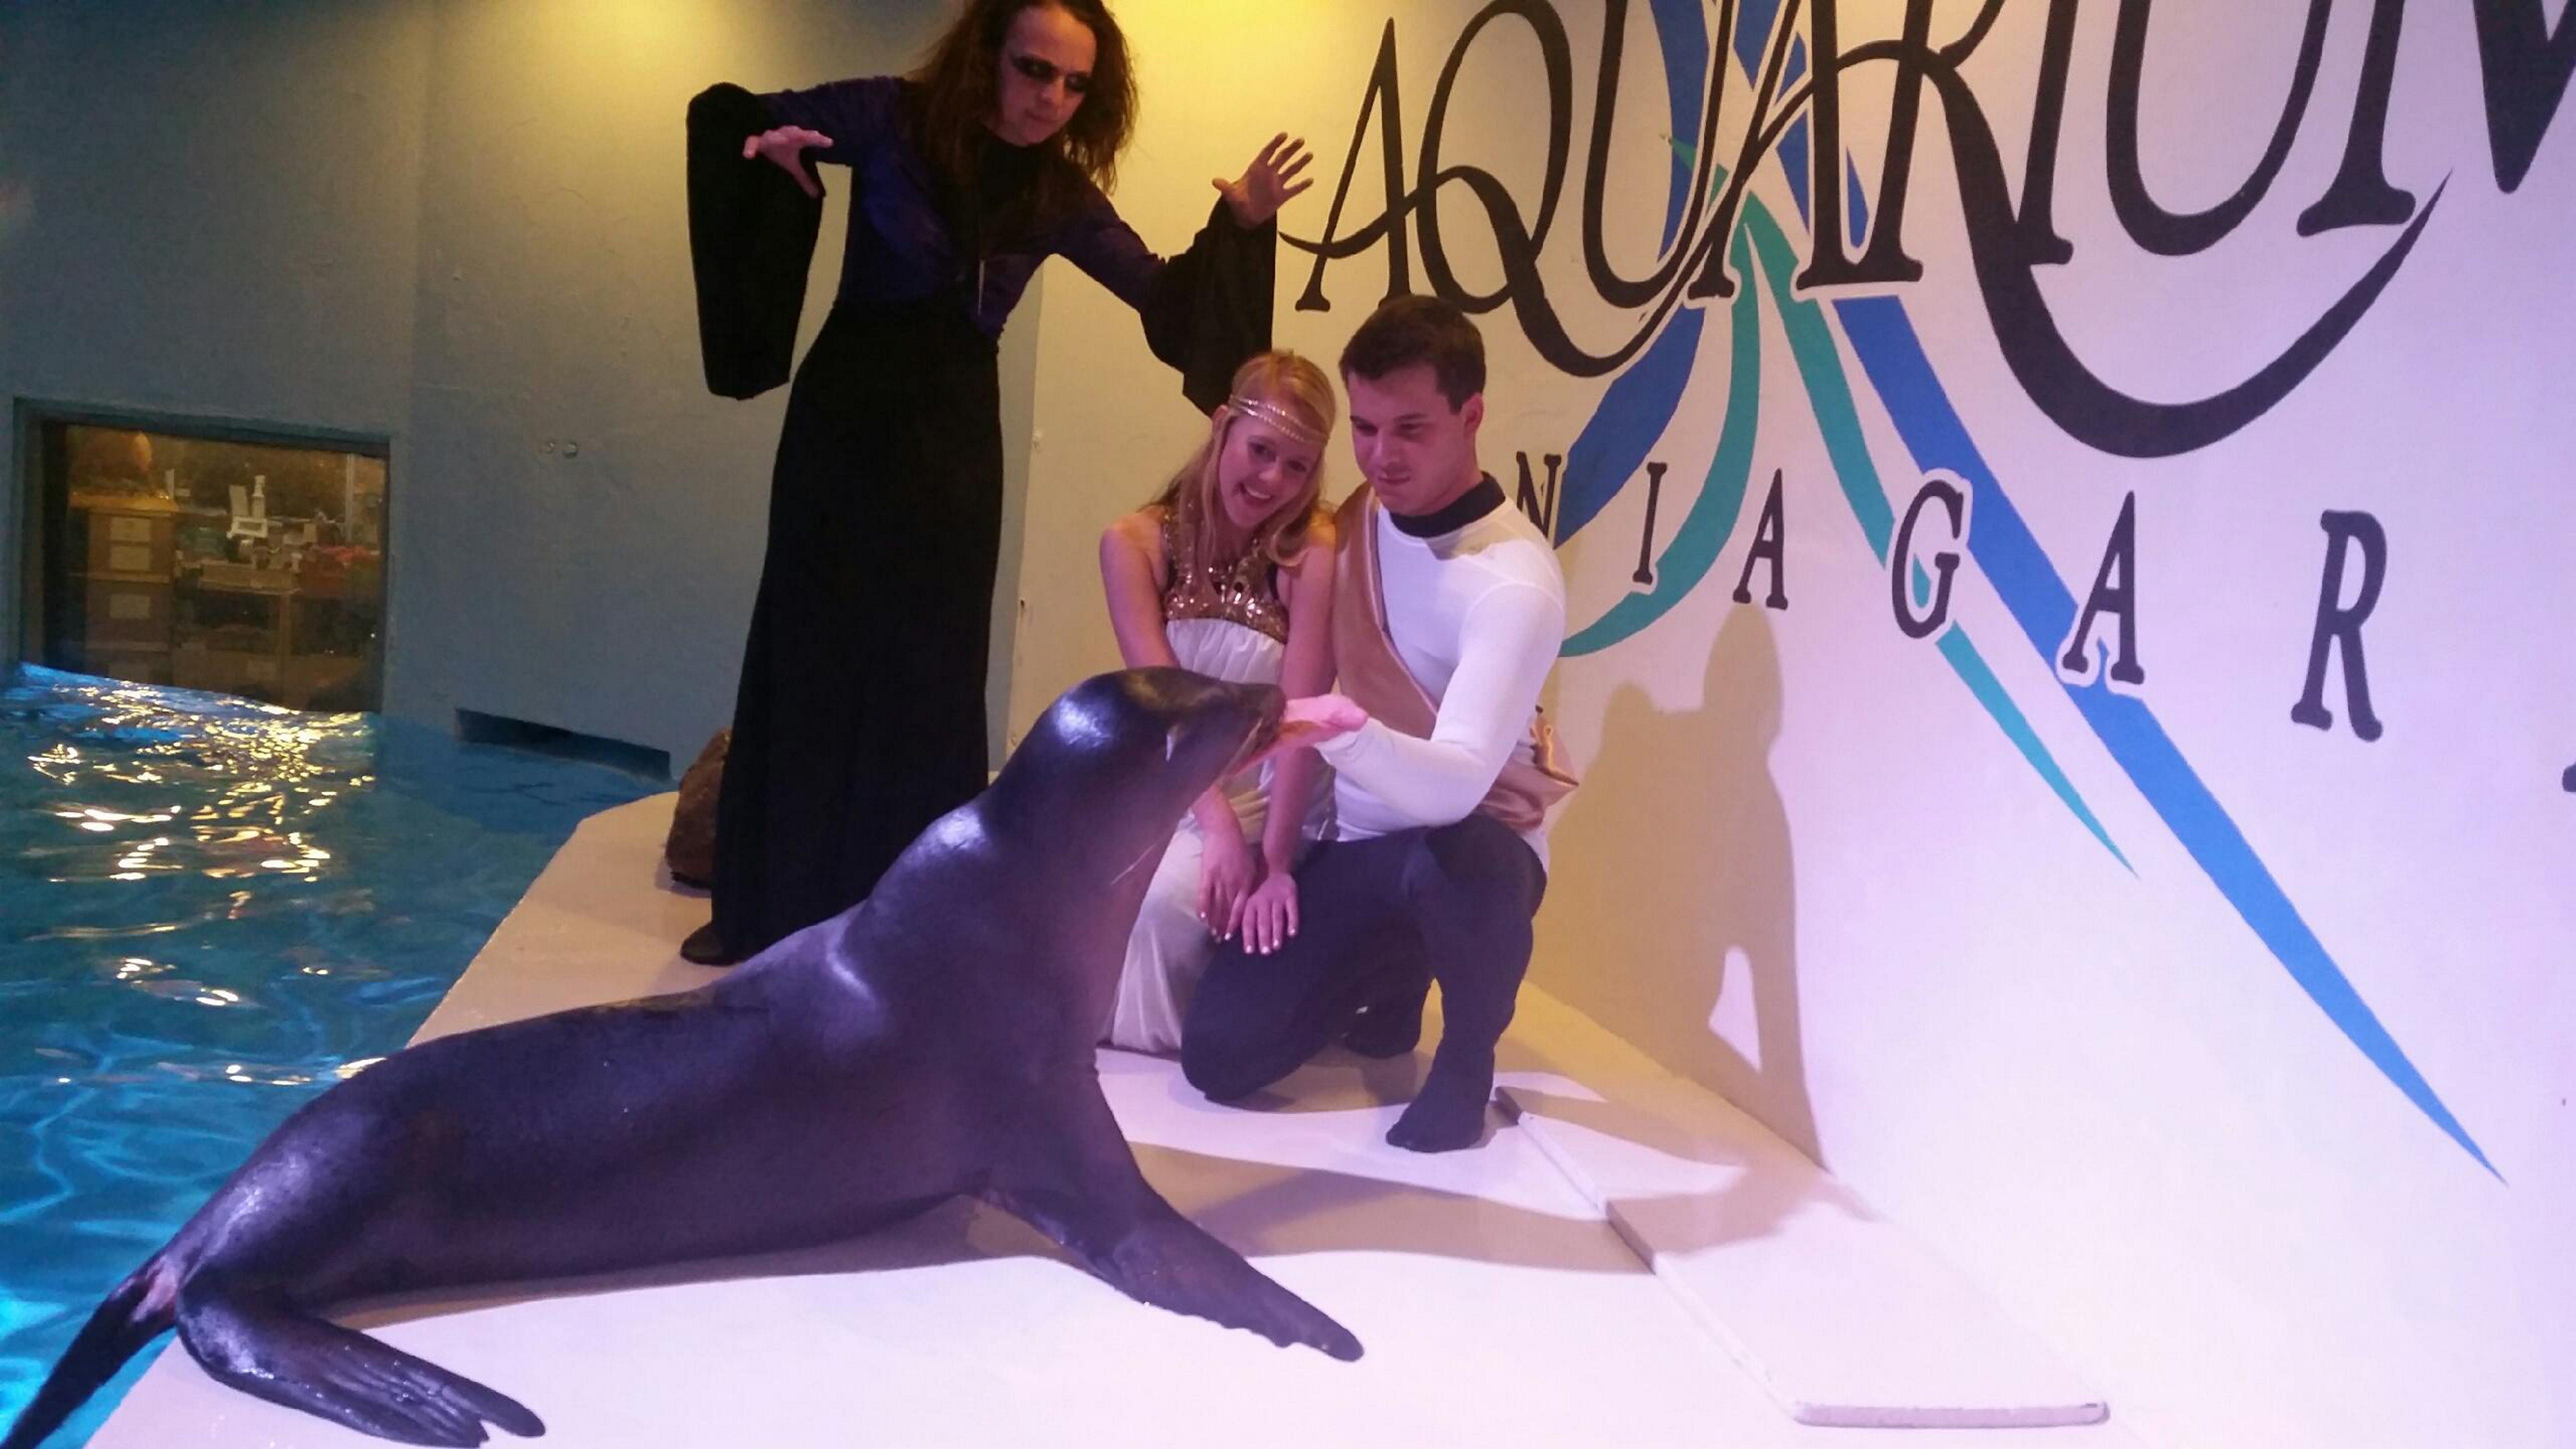 The Aquarium of Niagara hosts Halloween Happenings on Oct. 24.